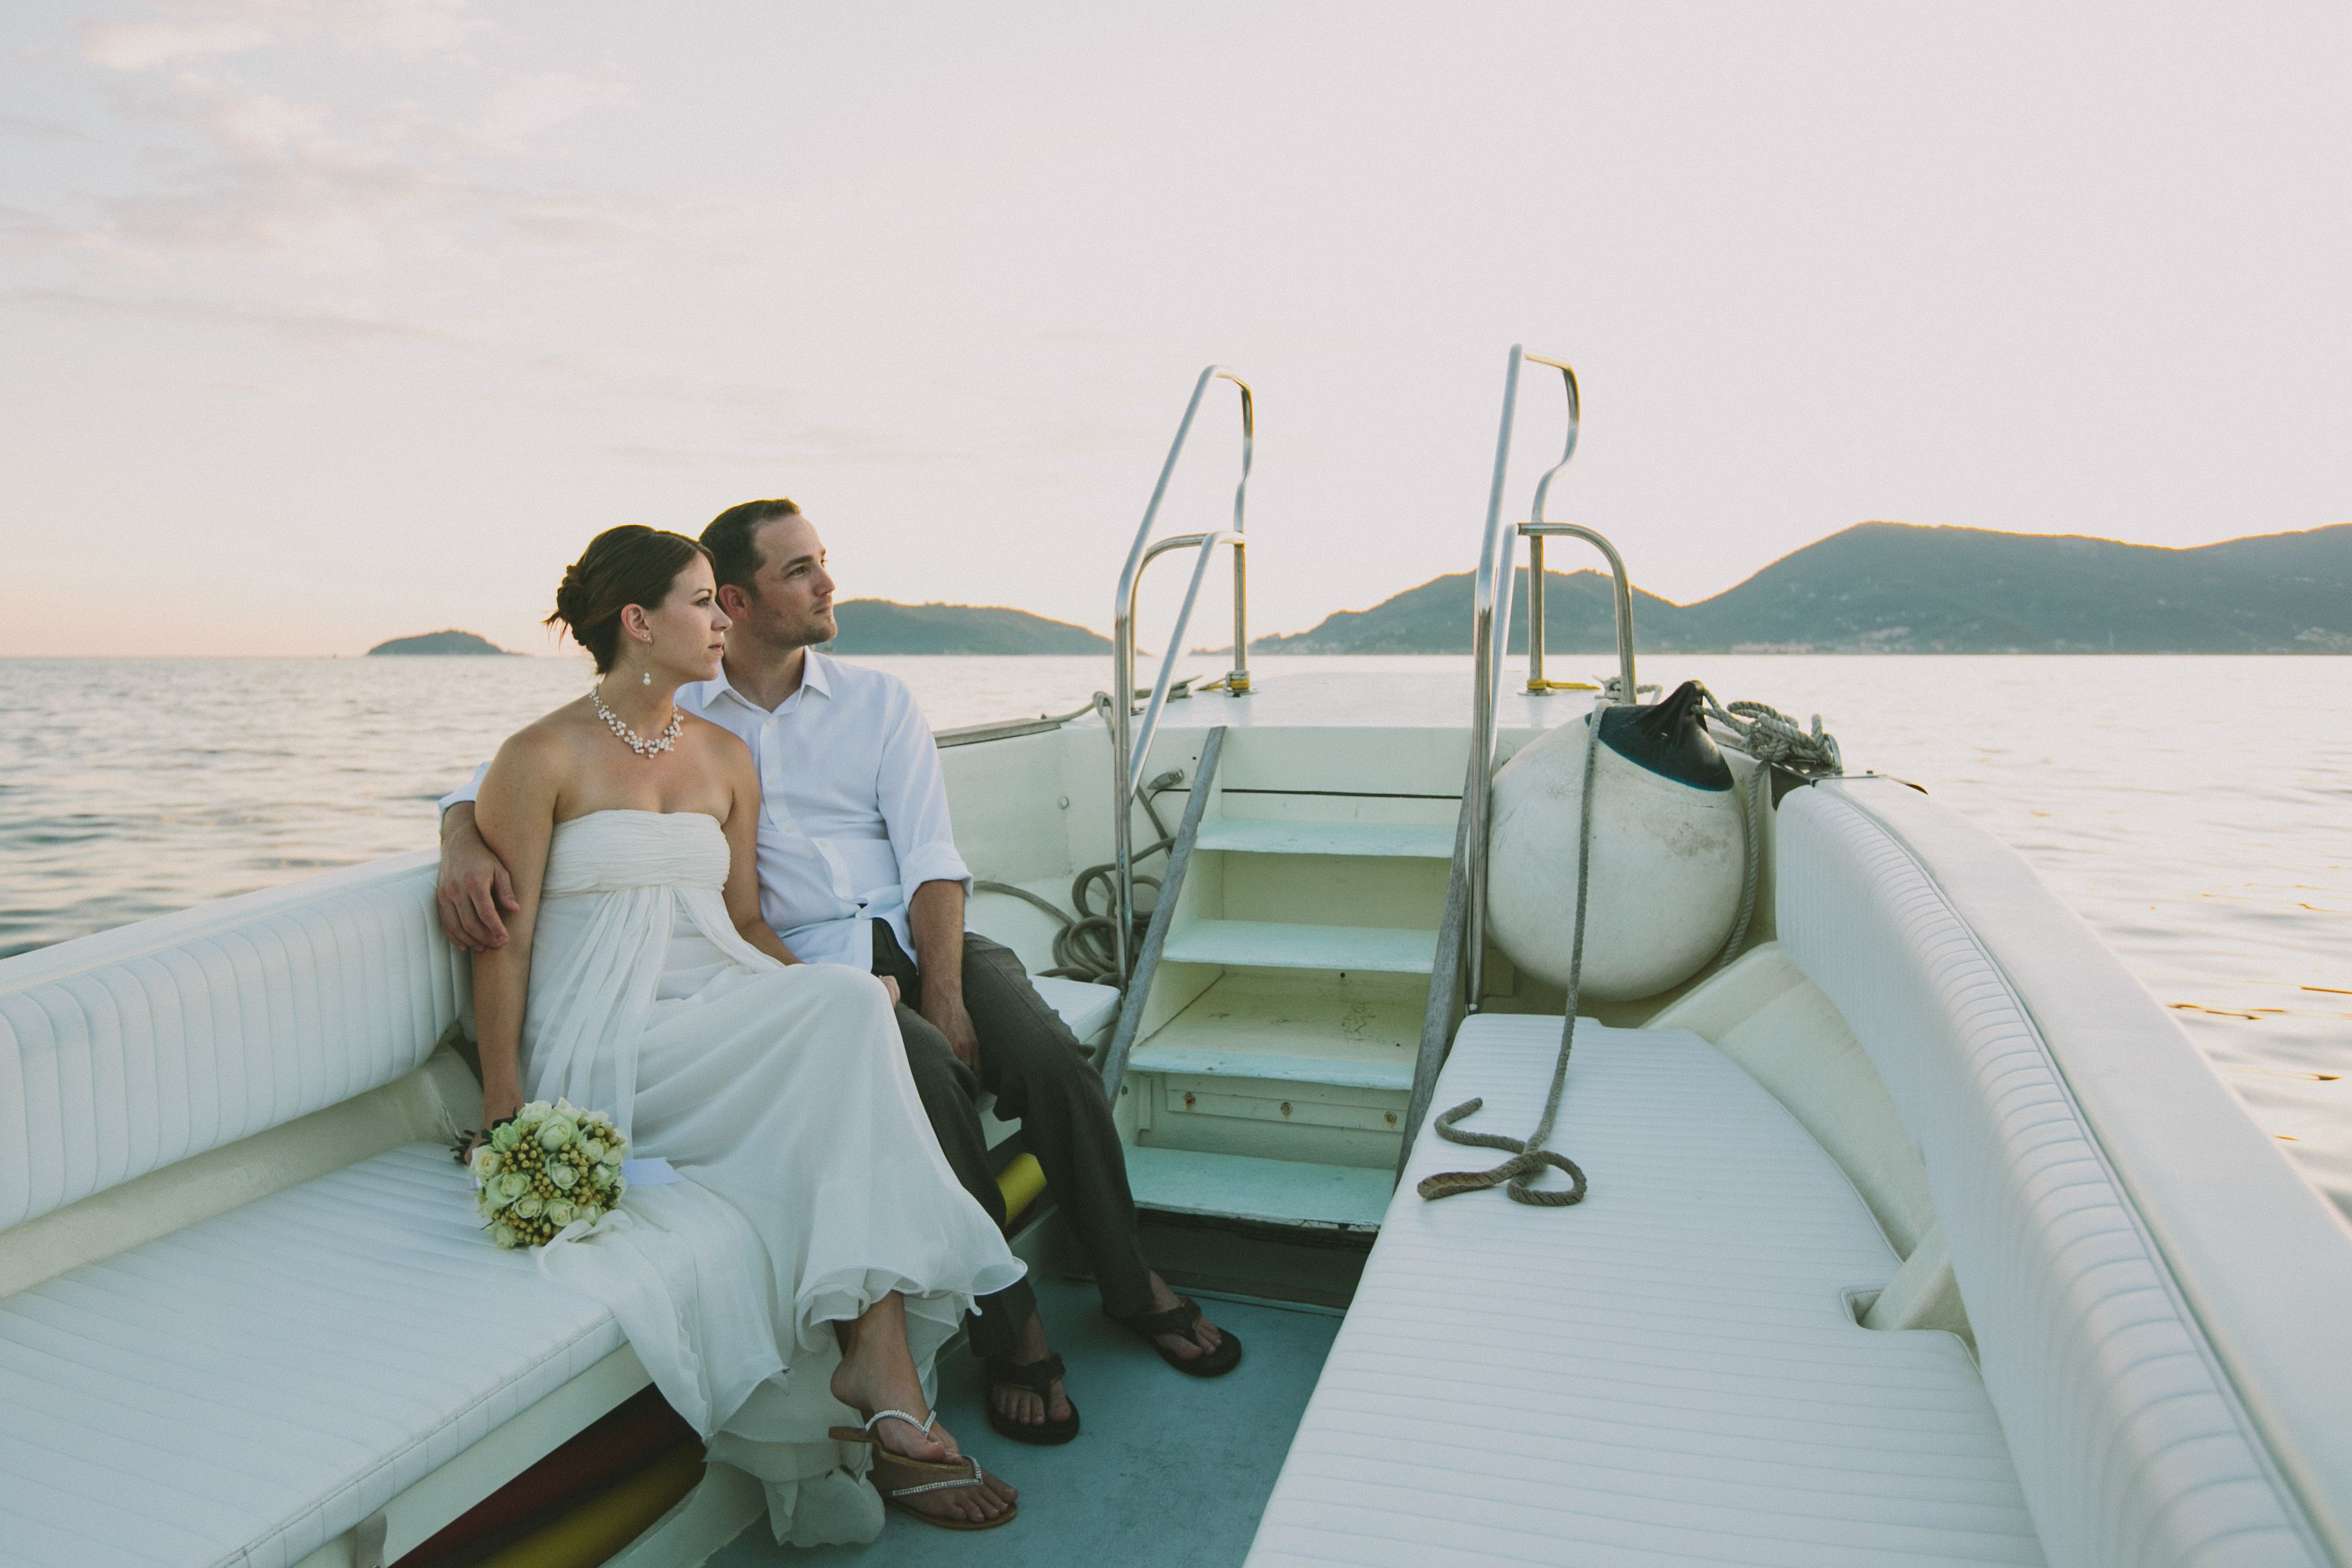 """Bay of Poets"" on the Ligurian Riviera www.tuscaniaevents.com"